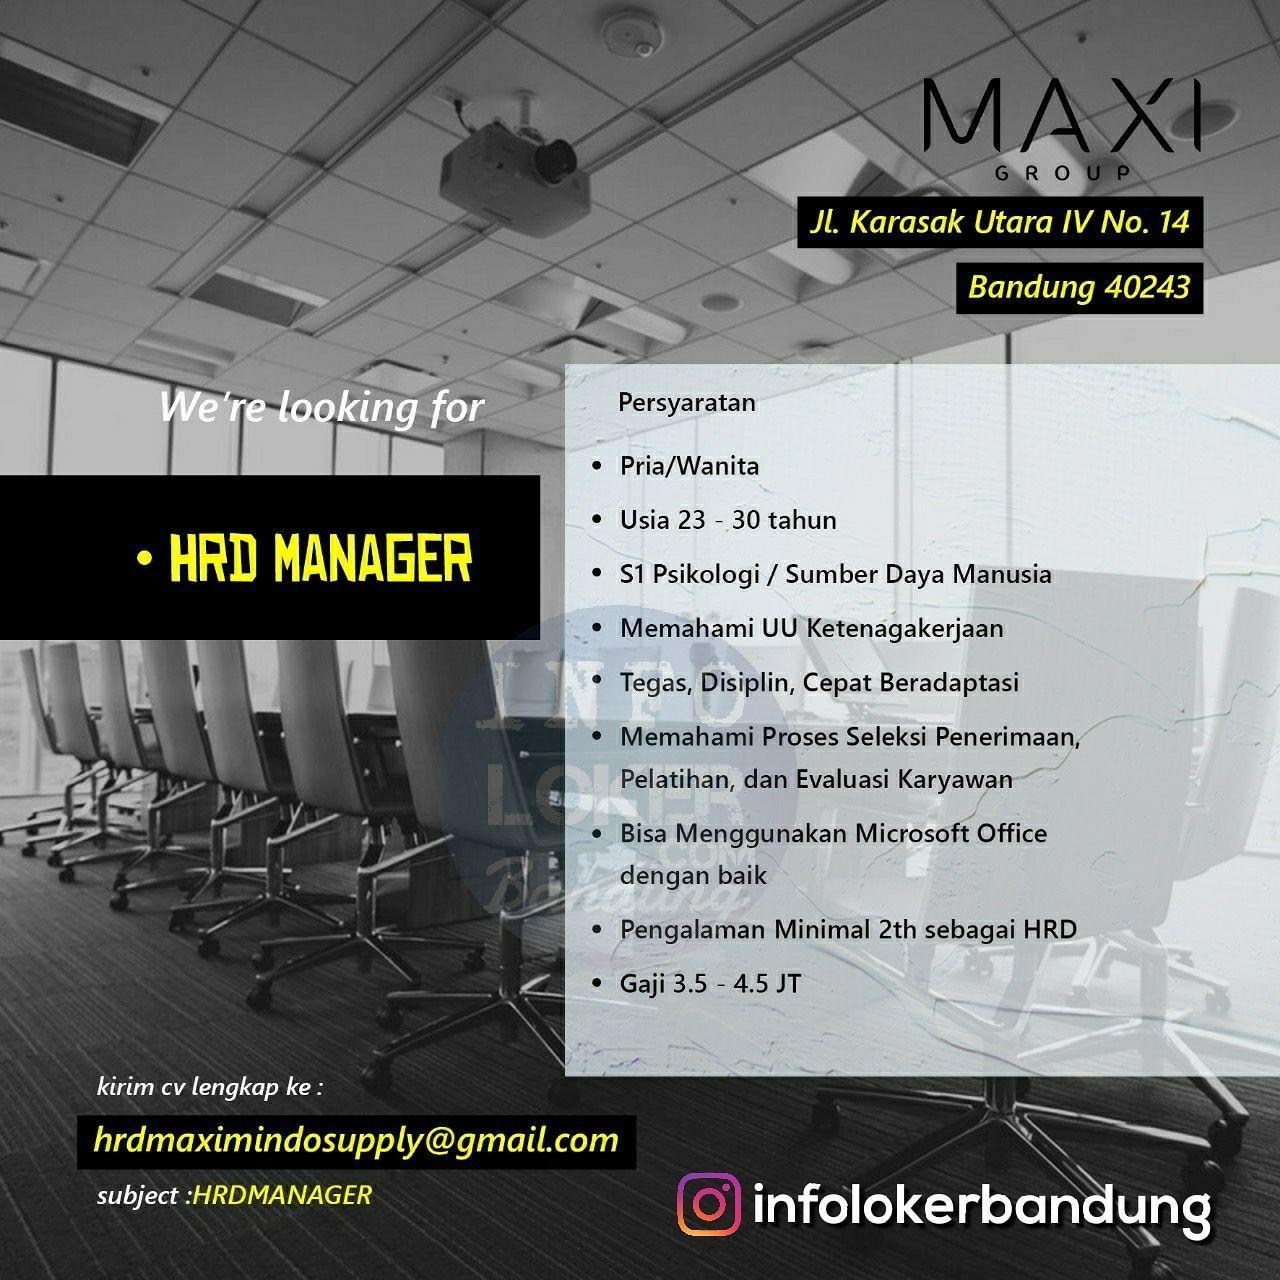 Lowongan Kerja Hrd Manager Maxi Group Bandung September 2018